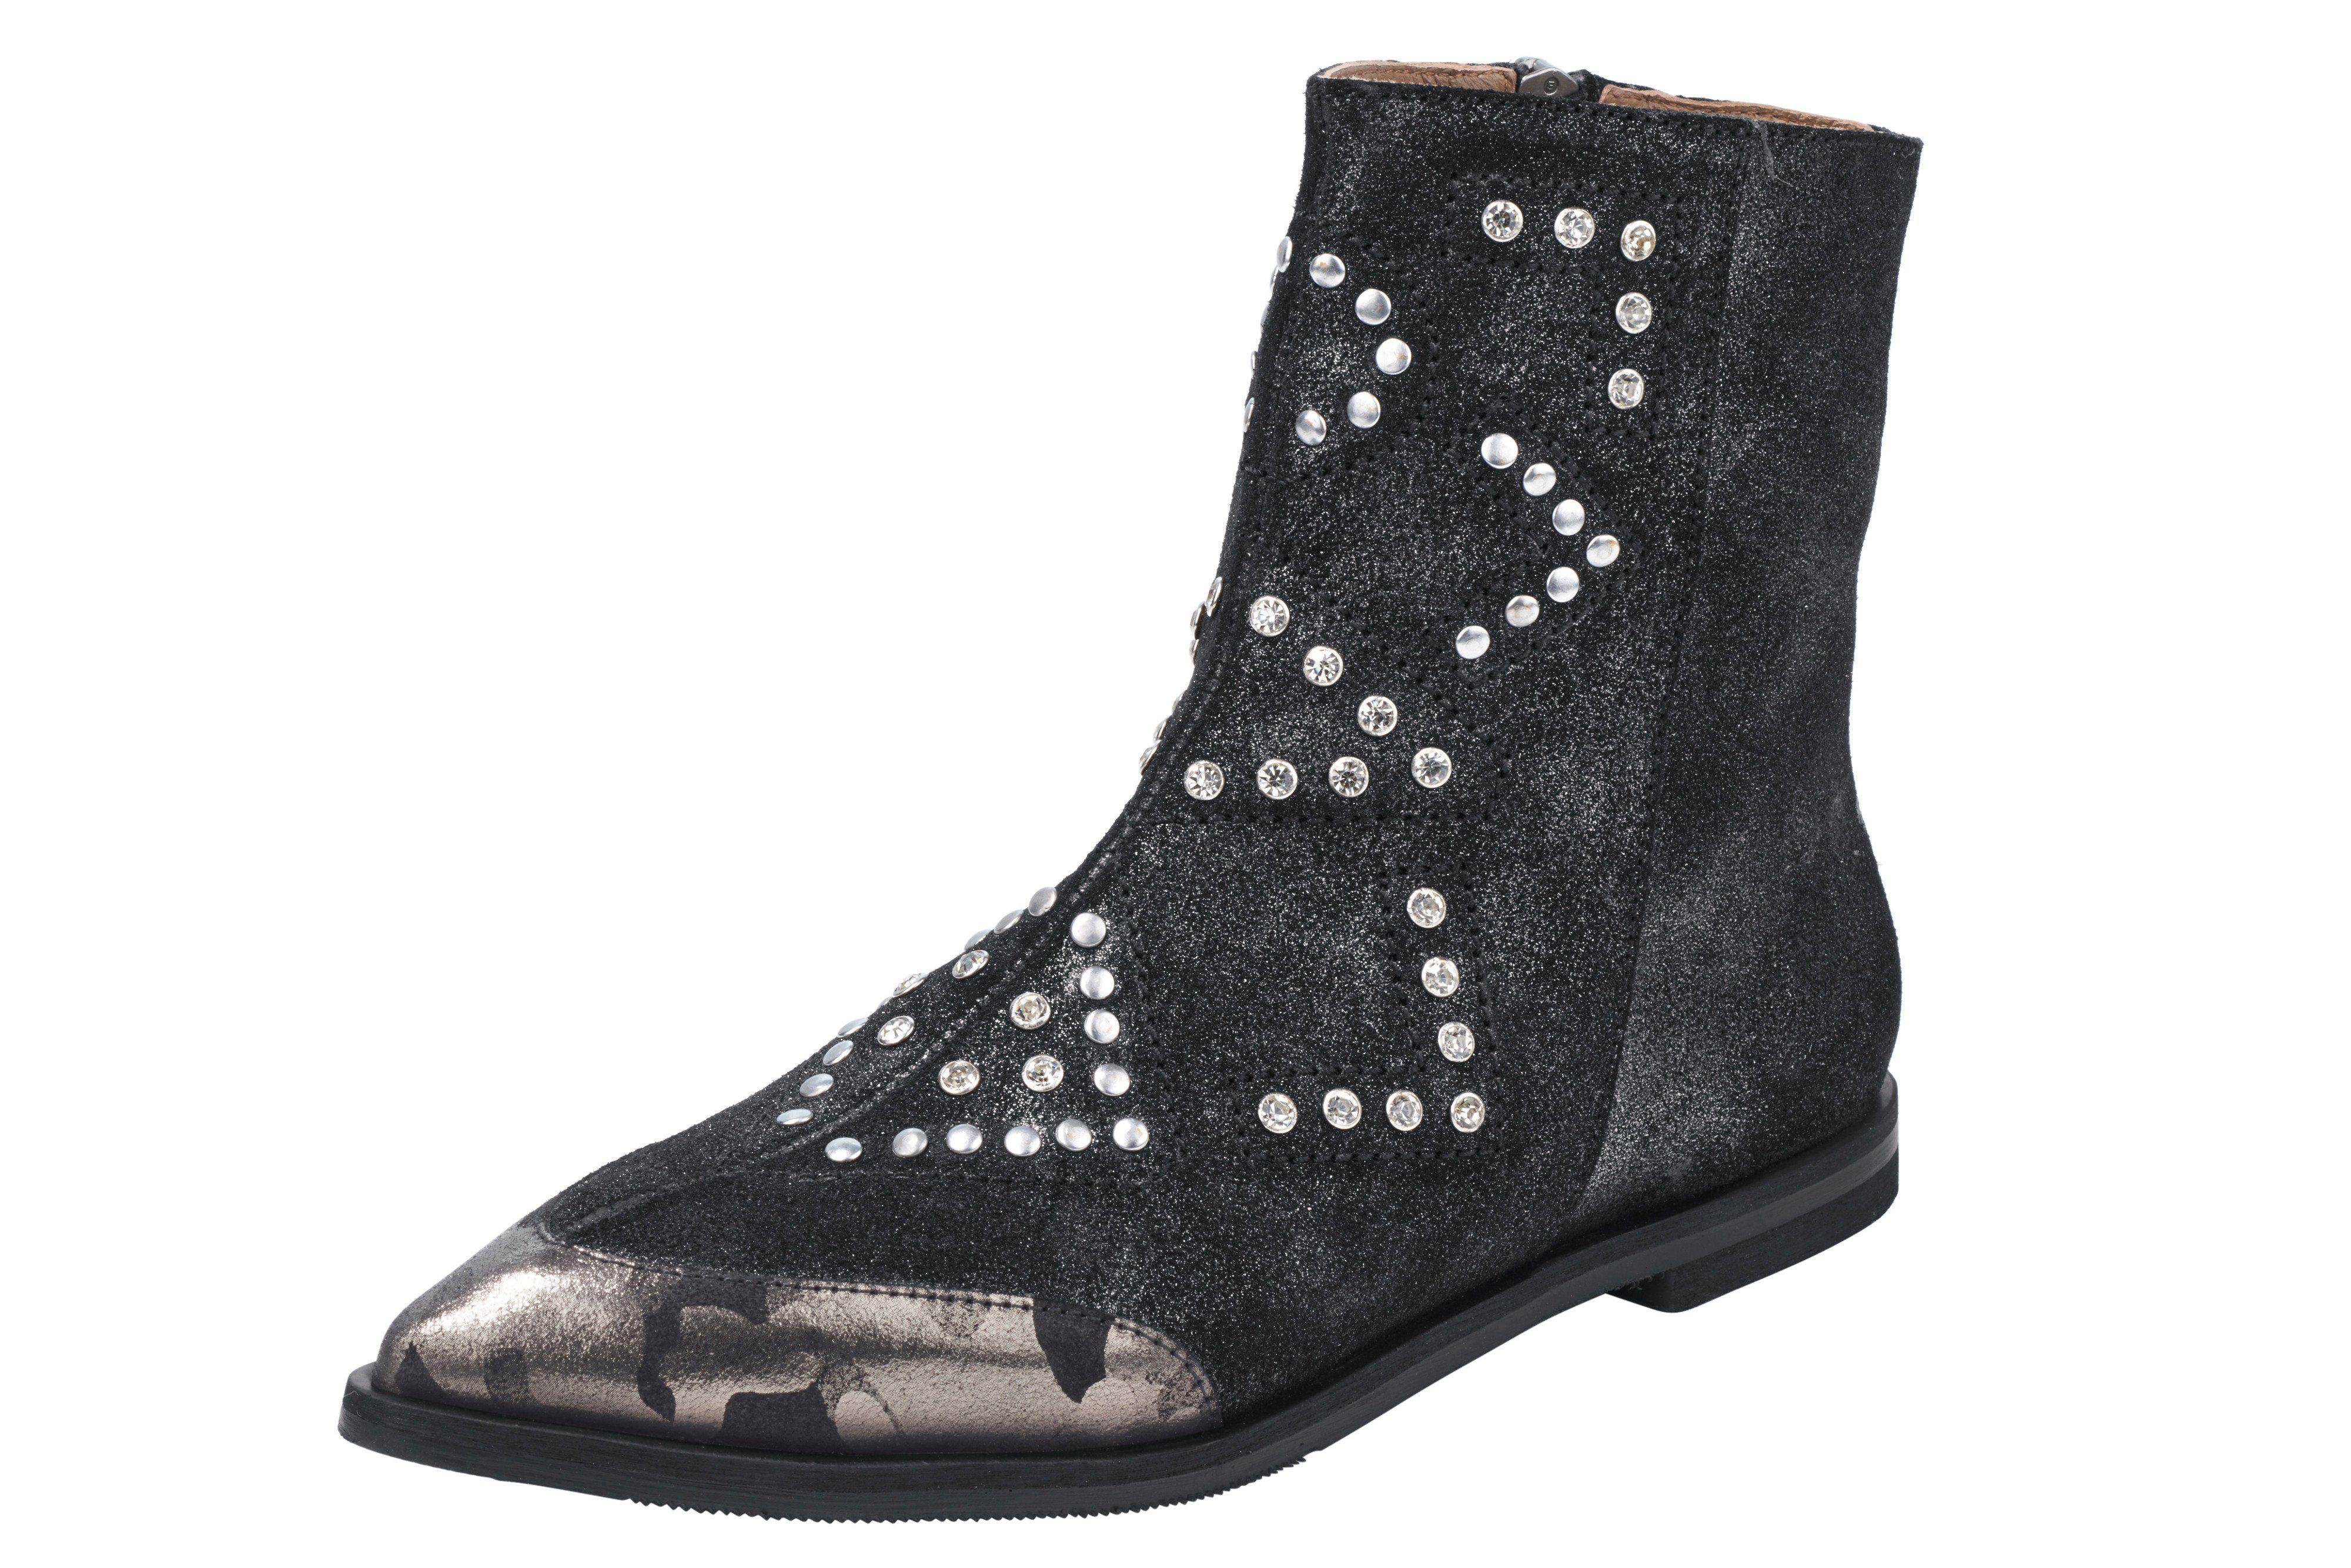 XYXYX Stiefelette online kaufen  schwarz#ft5_slash#metallic